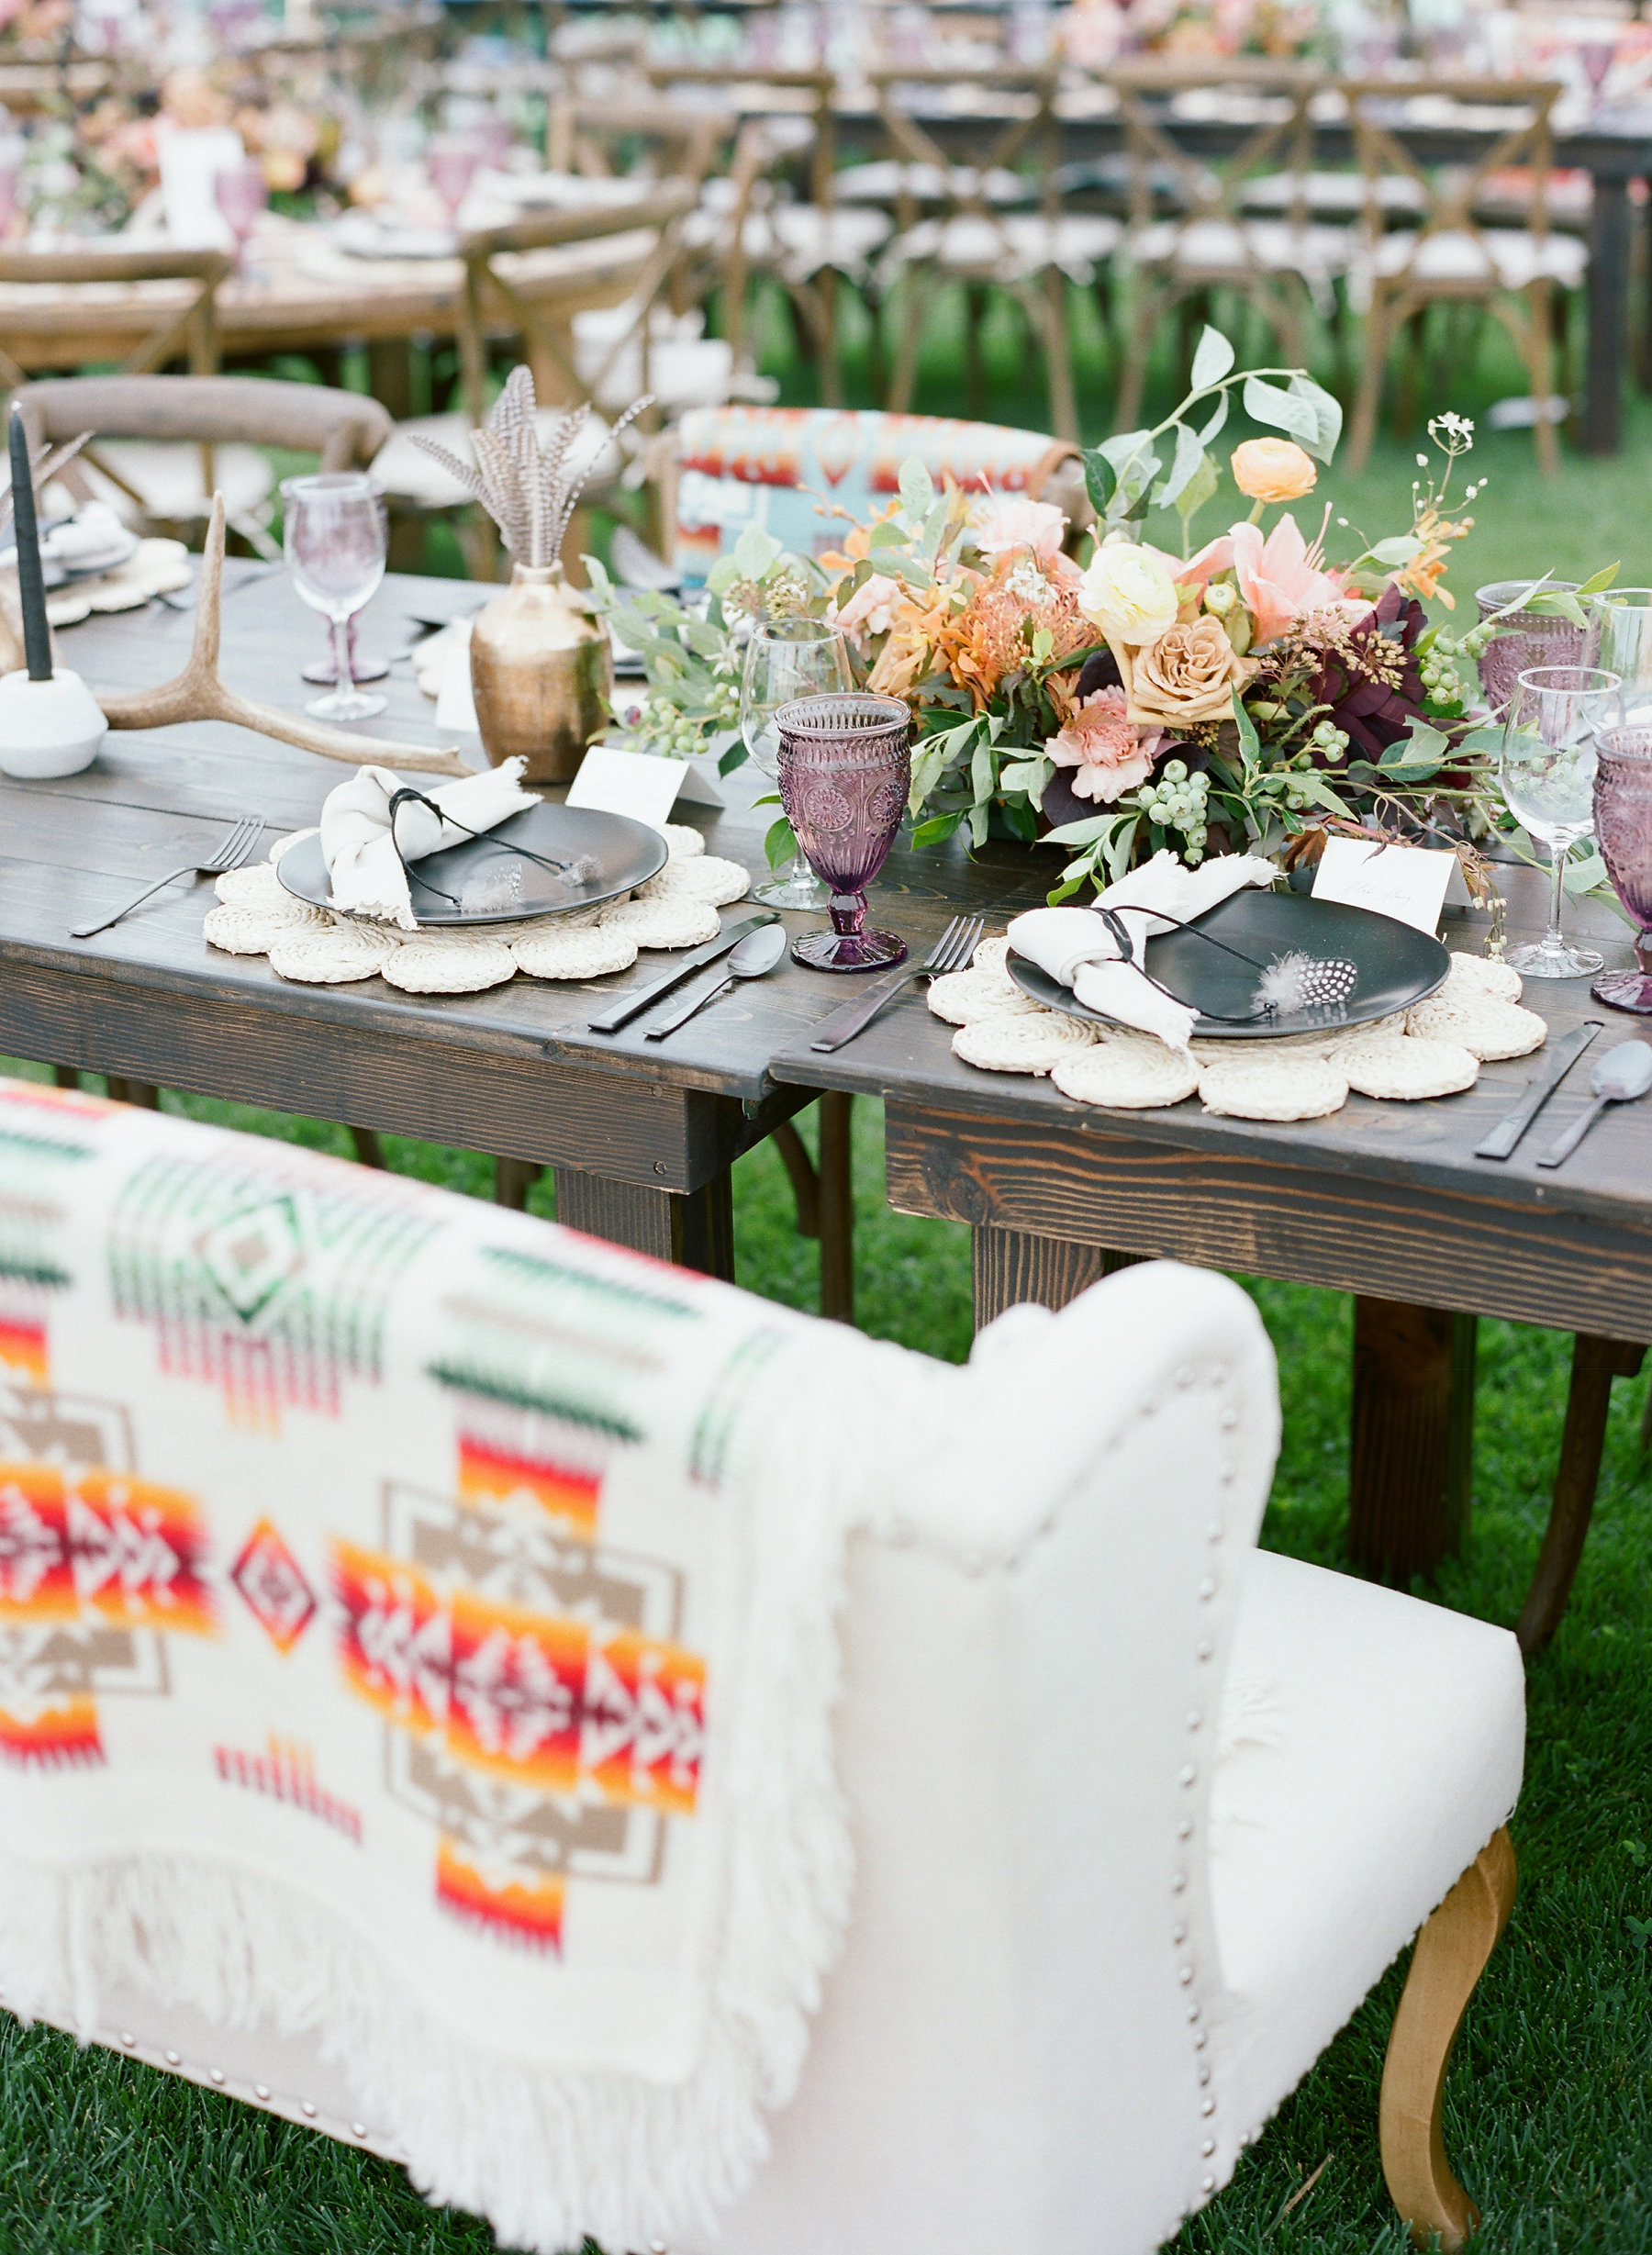 Jackson Hole wedding planners